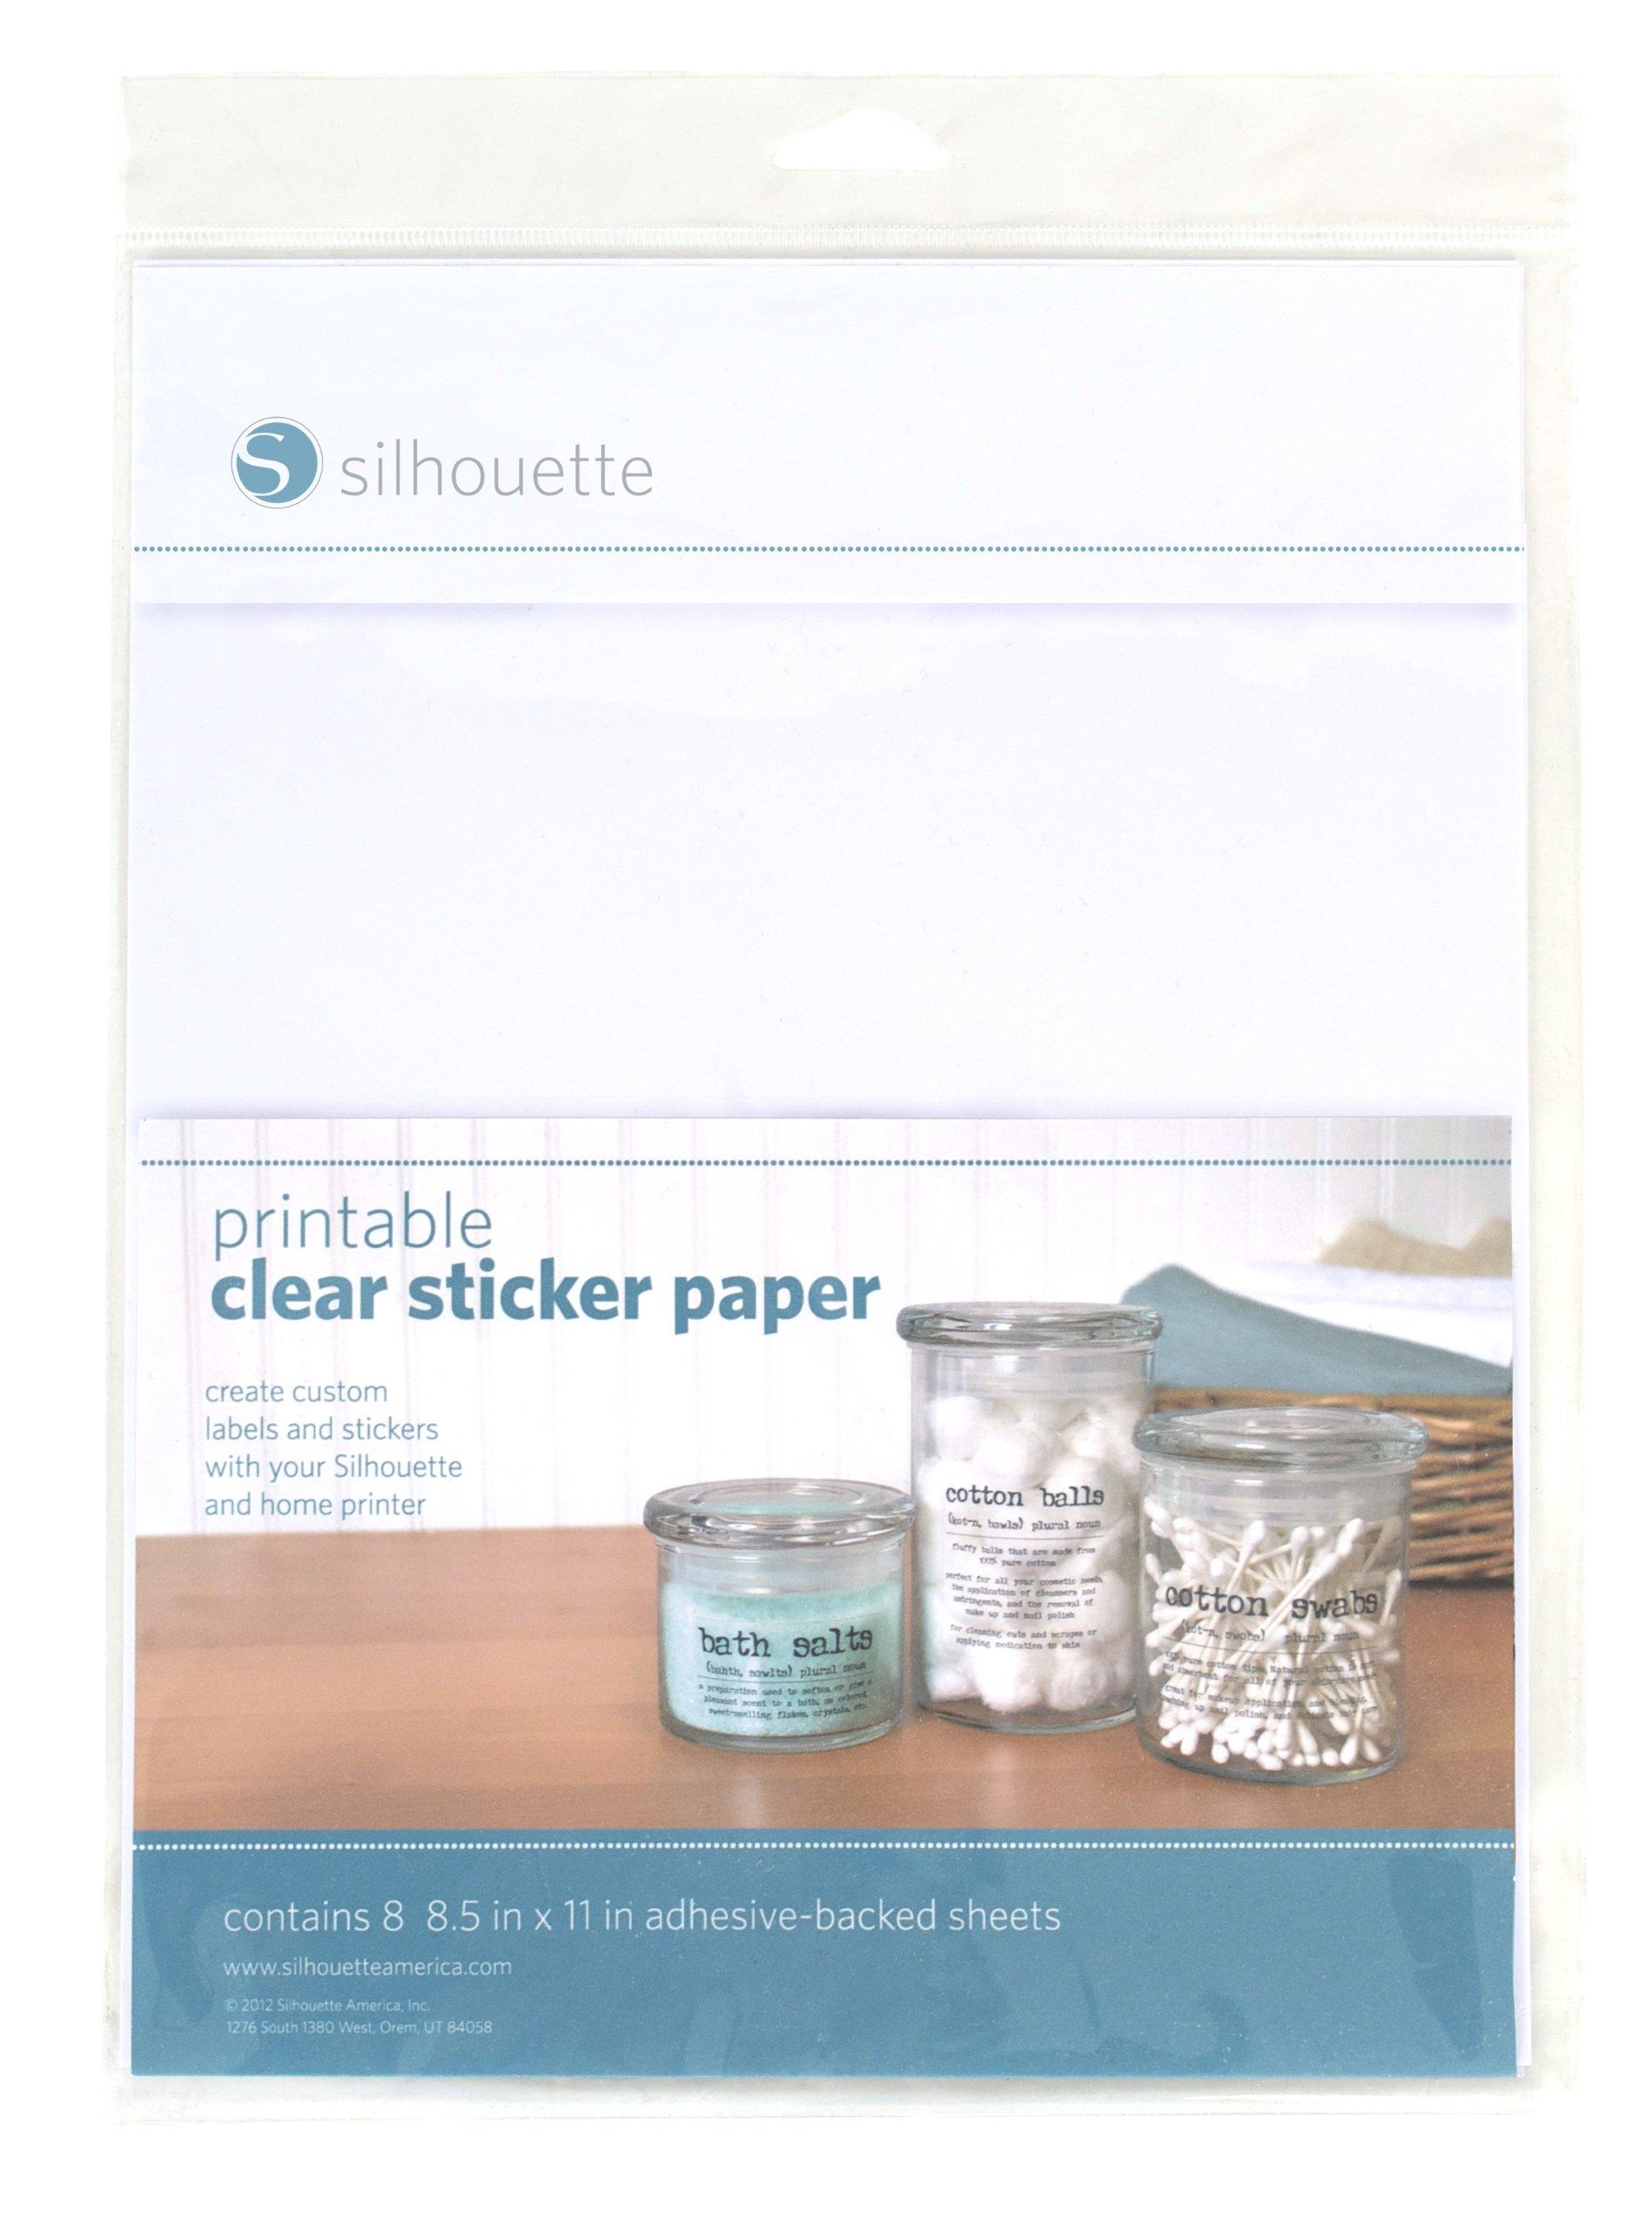 Silhouette MEDIA-CLR-ADH Printable Clear Sticker Paper